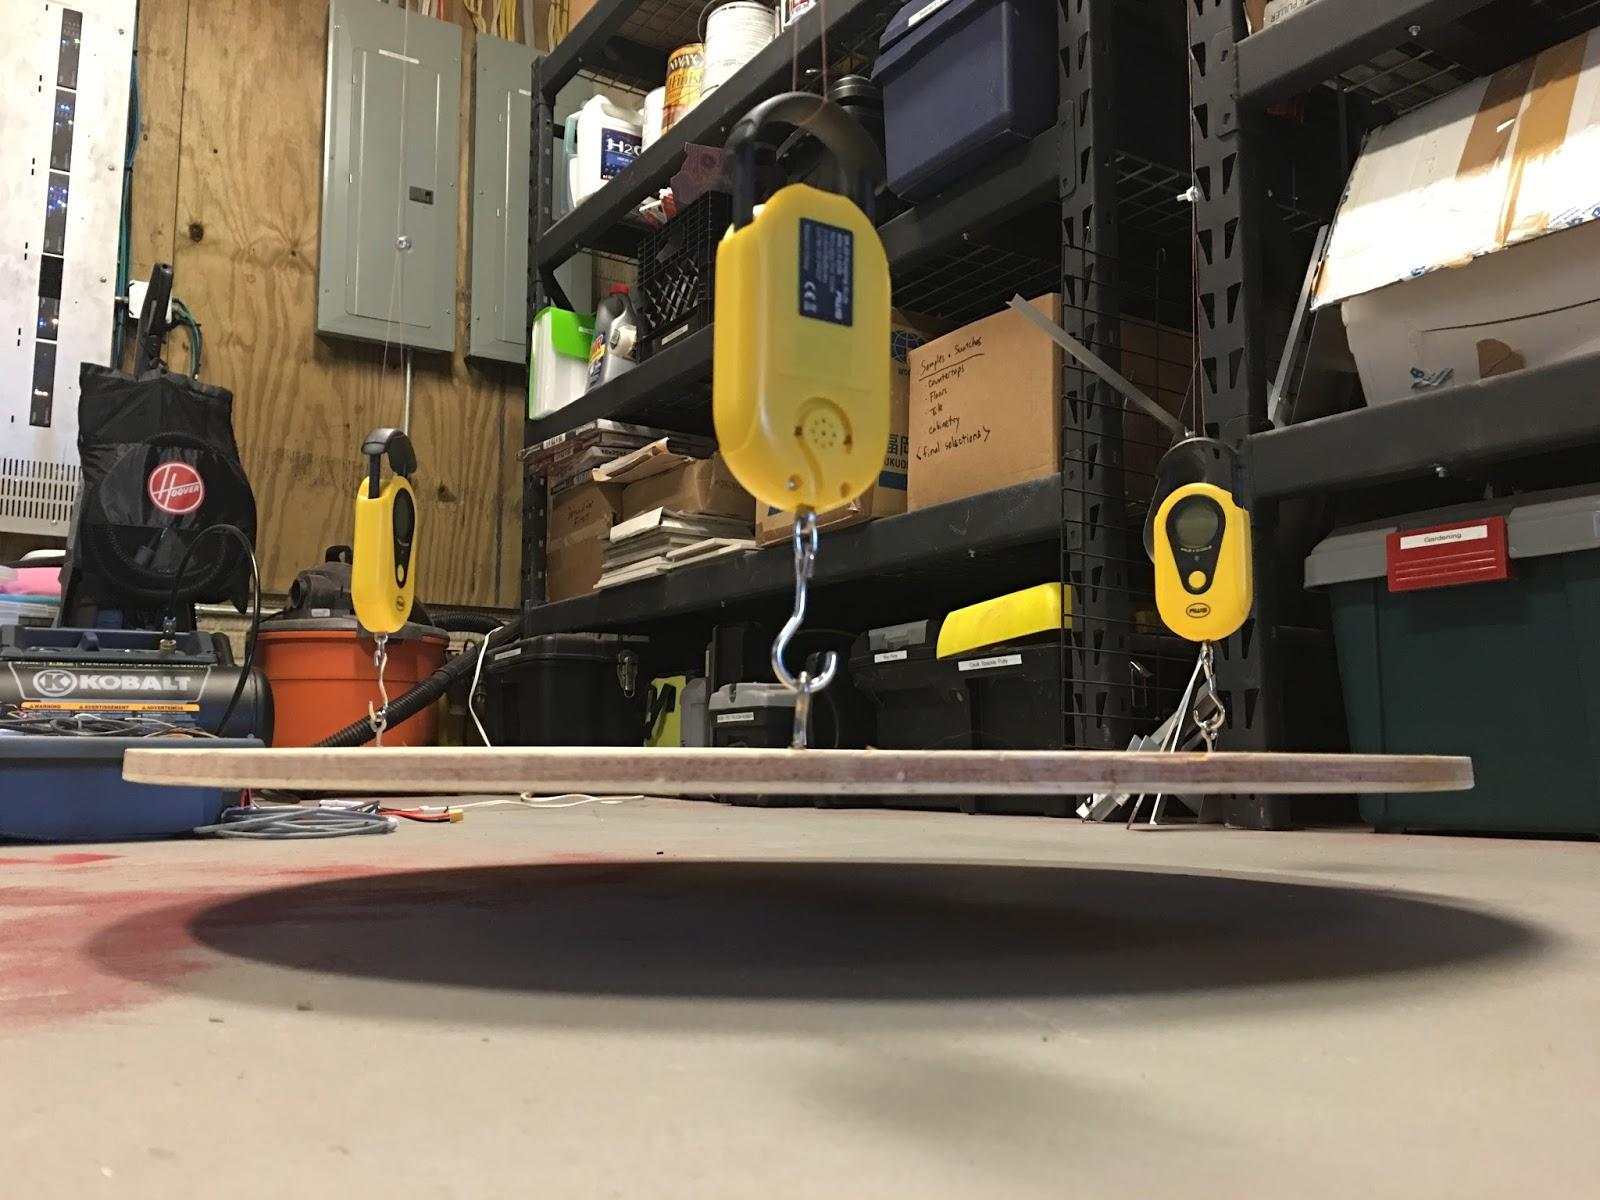 Nice and level: The pendulum platform